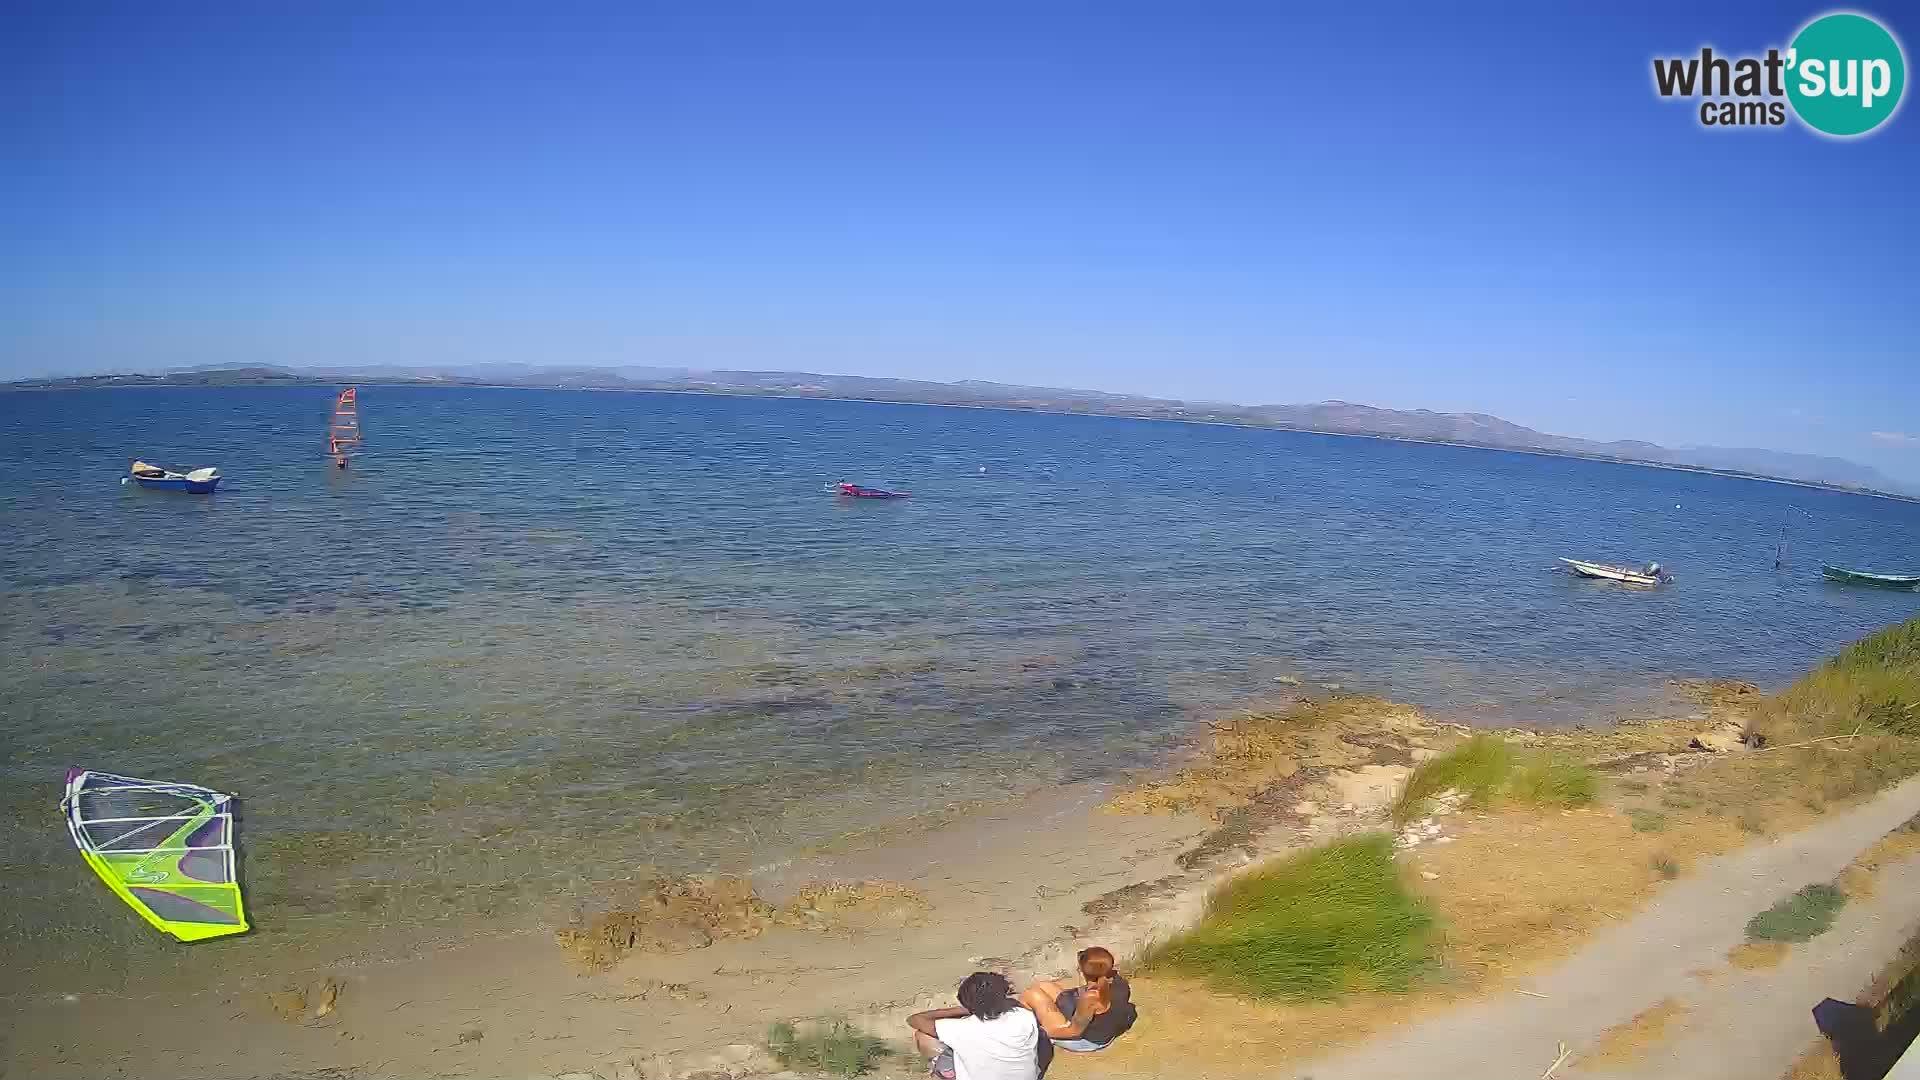 Windsurfing Club Sa Barra Live Webcam Sant'Antioco – Sardinia – Italy